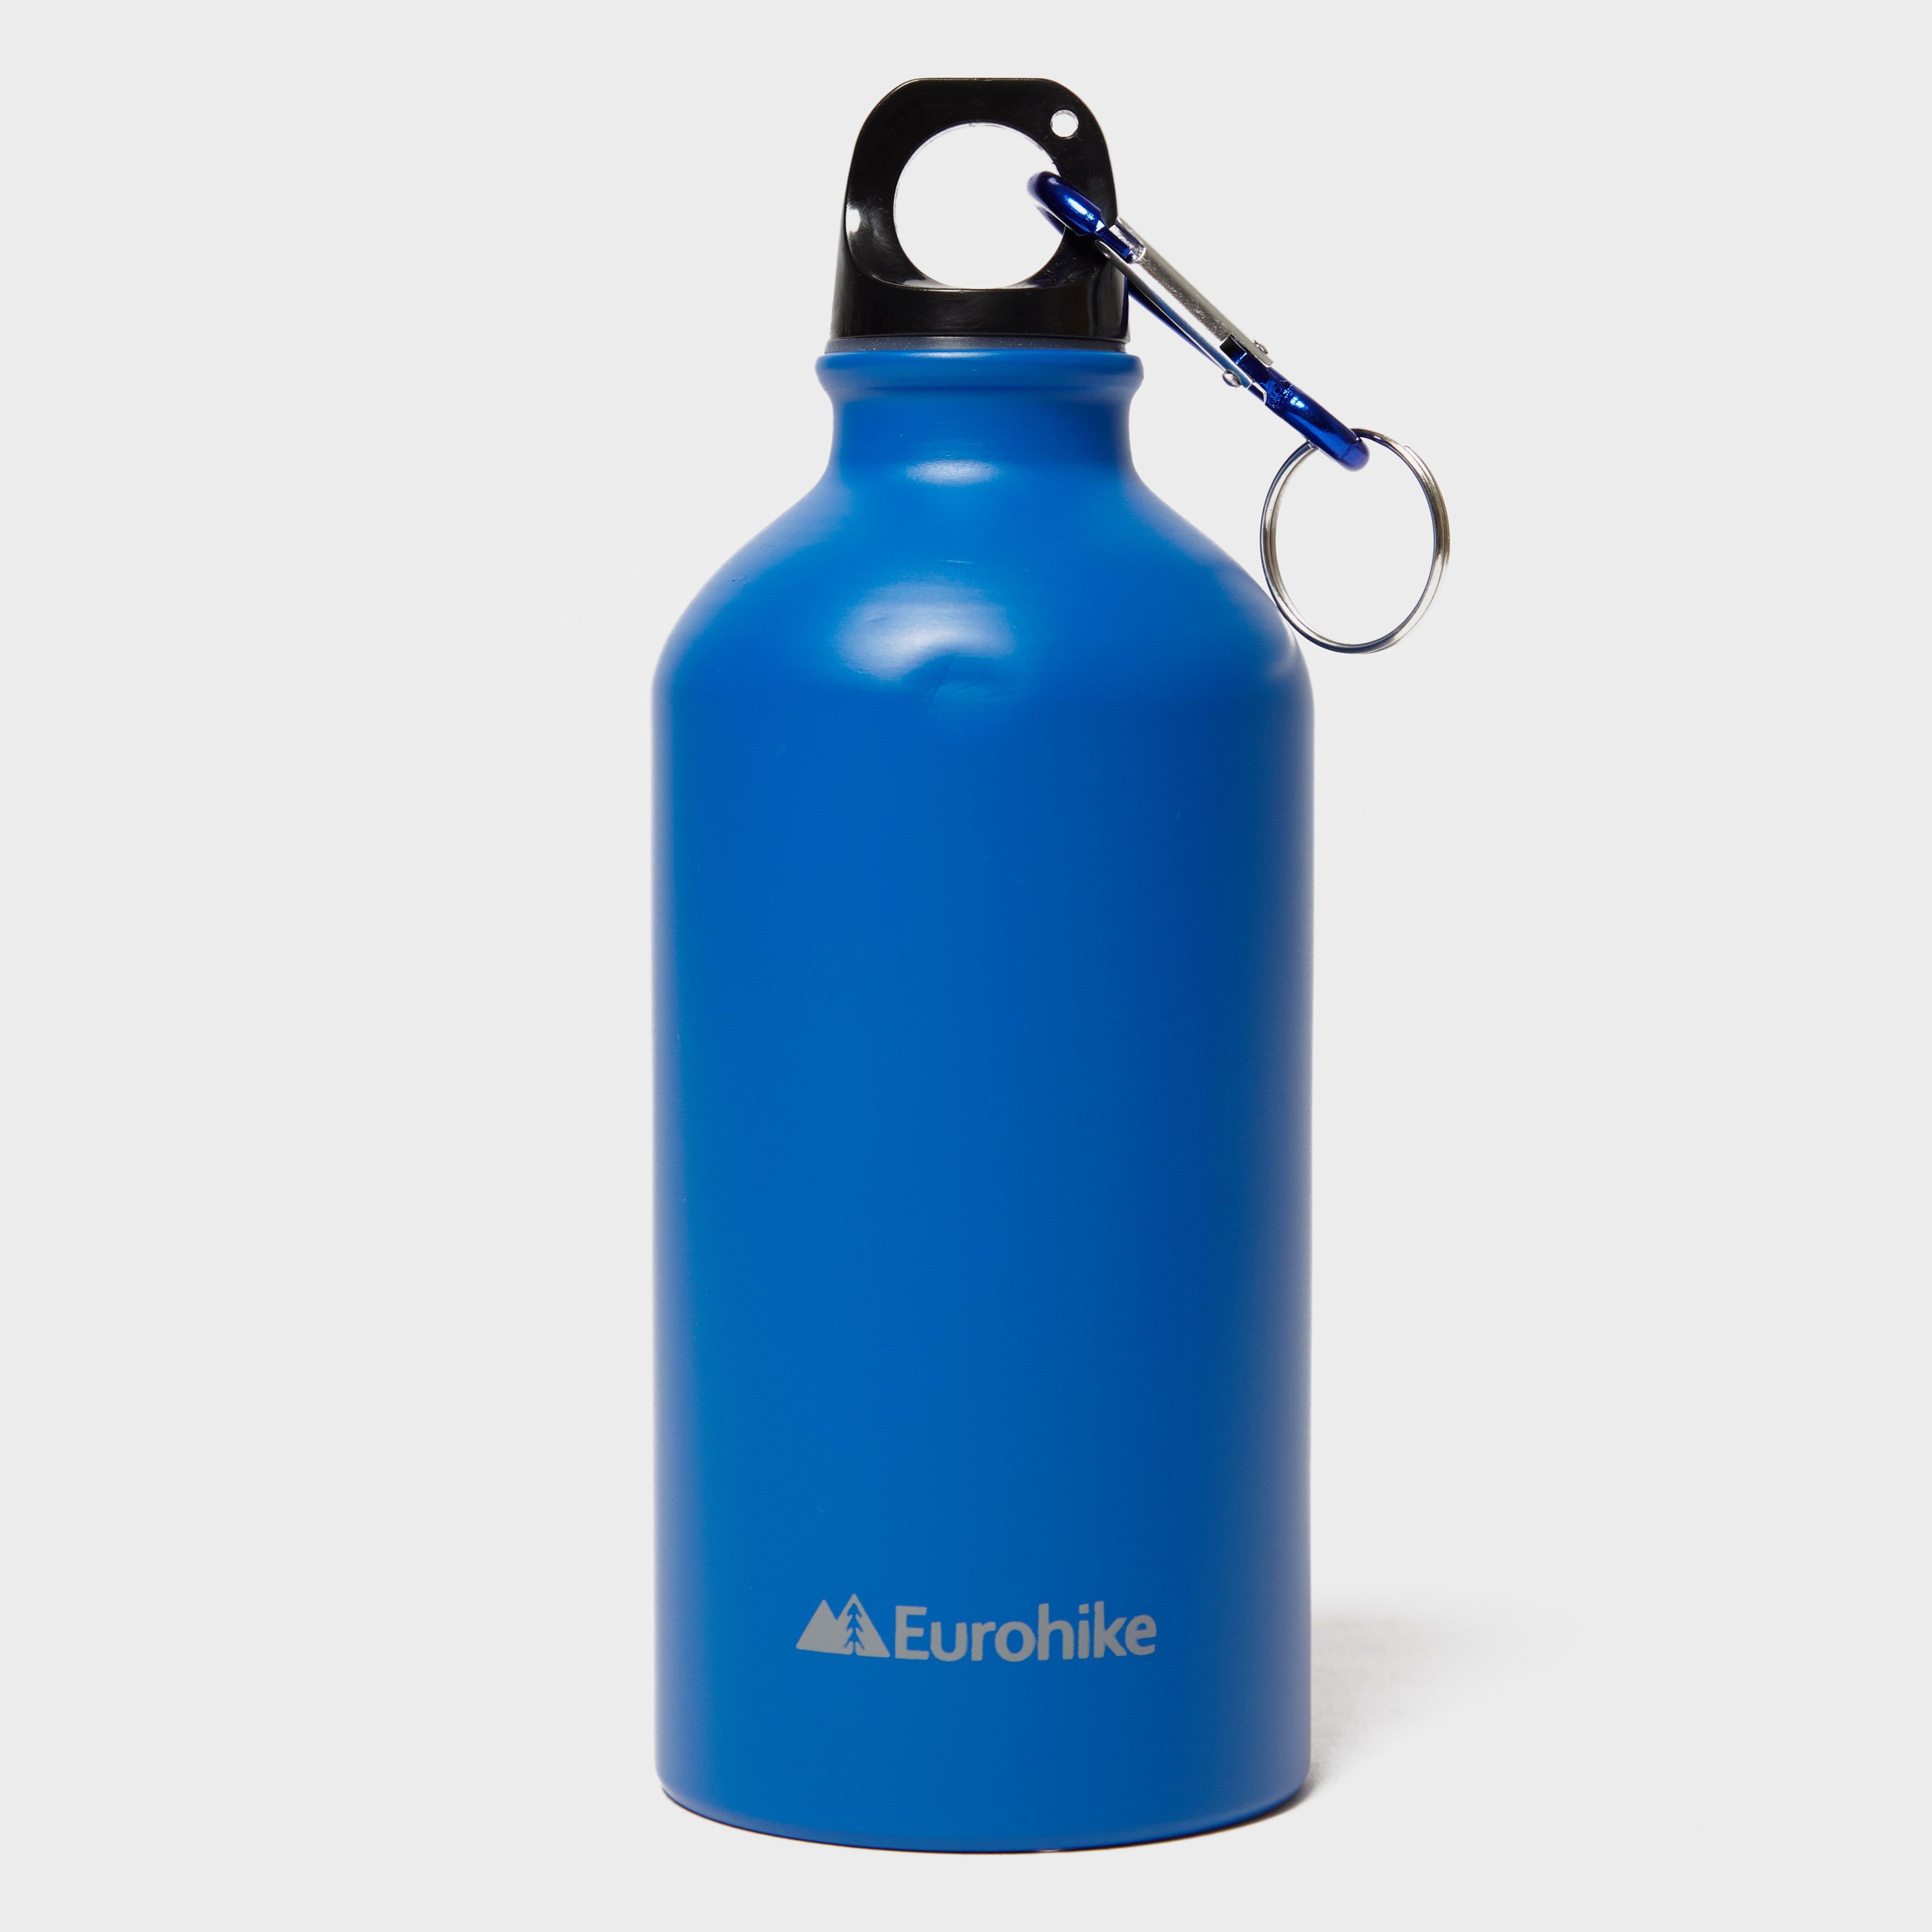 Eurohike Aqua 0.5L Aluminium Water Bottle, Blue/BLU